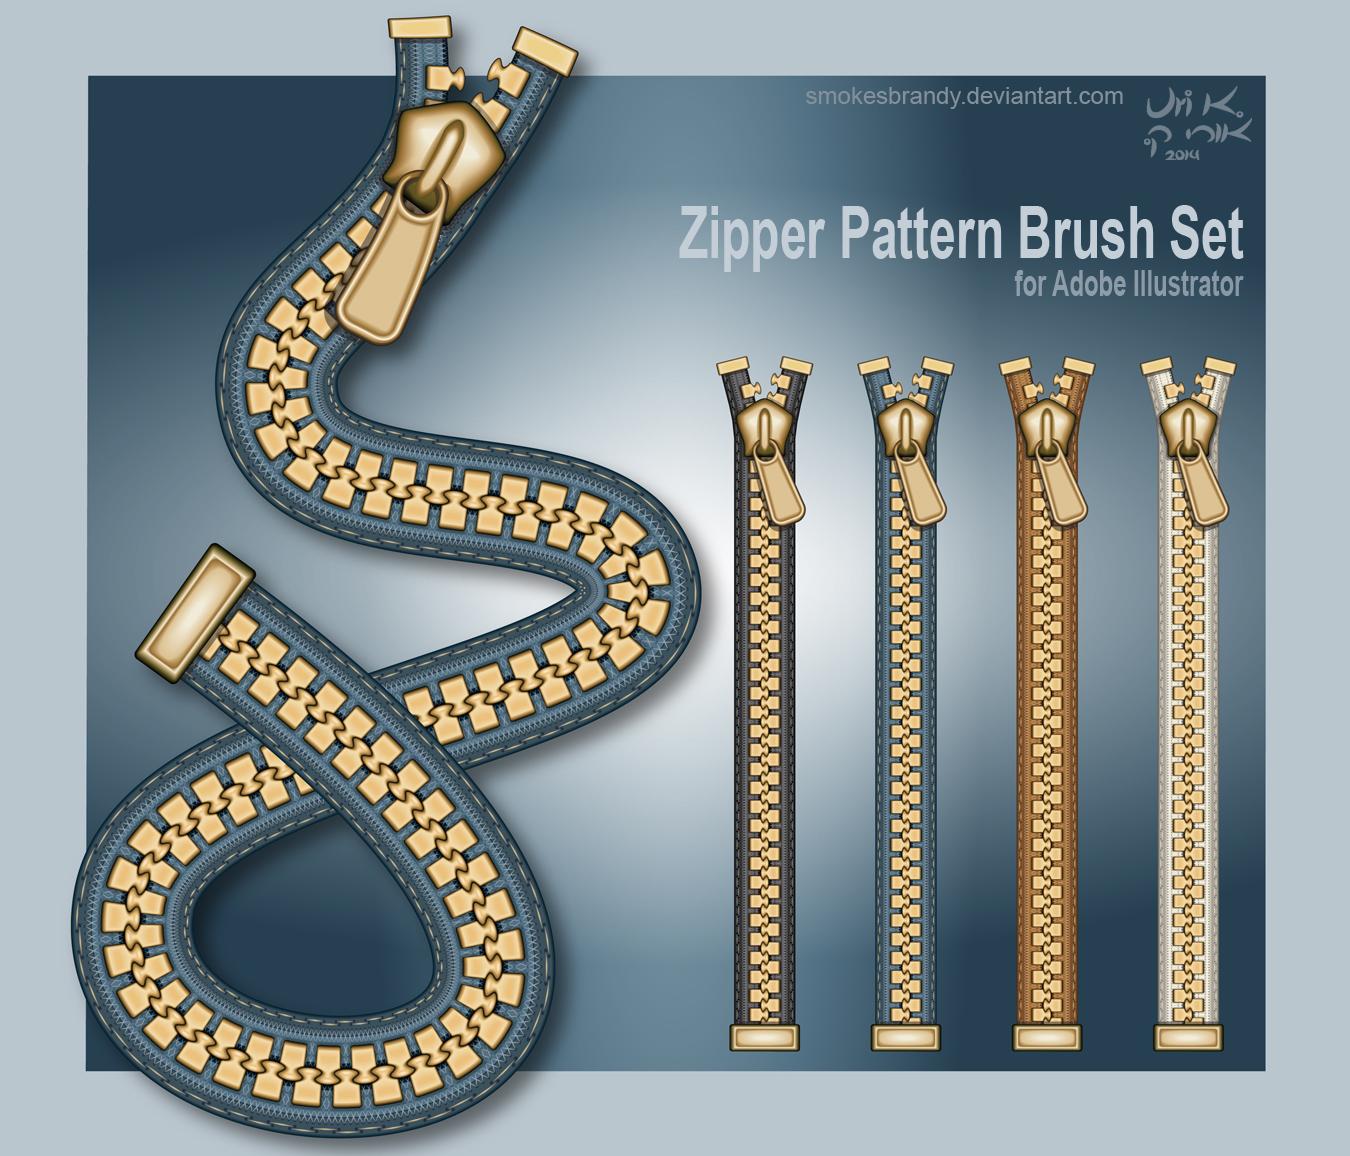 Zipper Brush Set